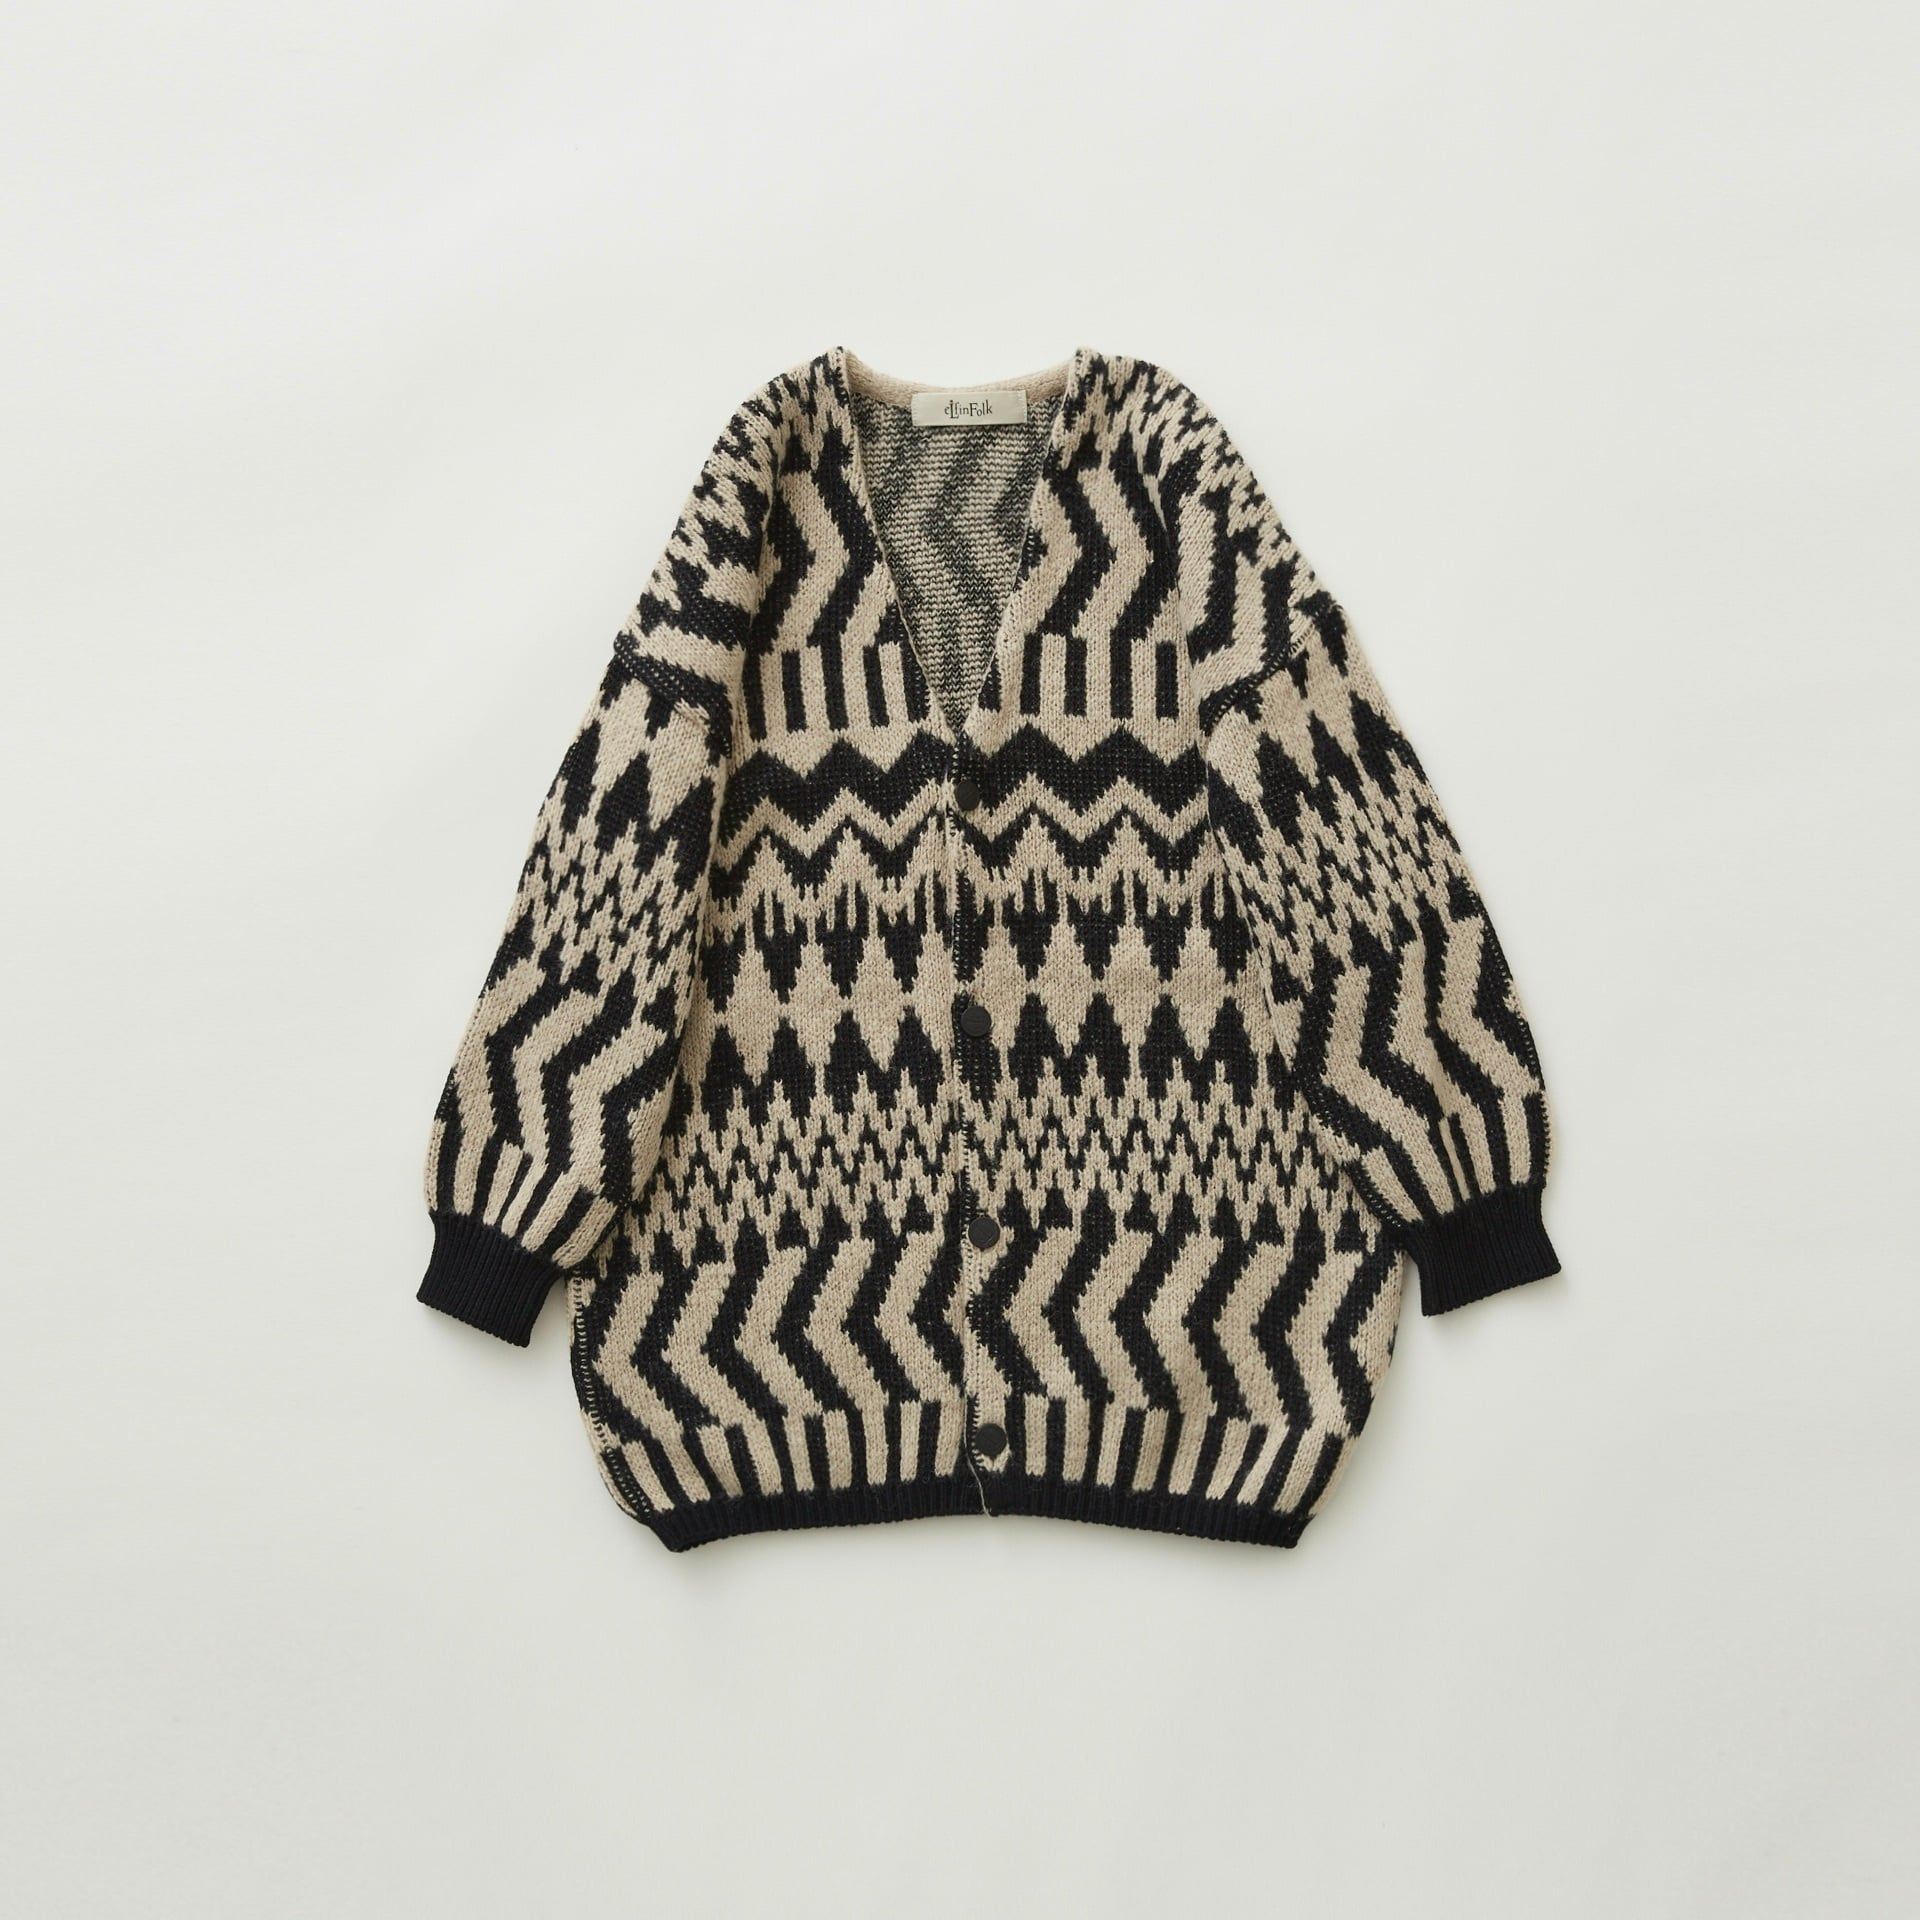 《eLfinFolk 2021AW》Folk jacquard  cardigan / black × ivory / 110・130cm